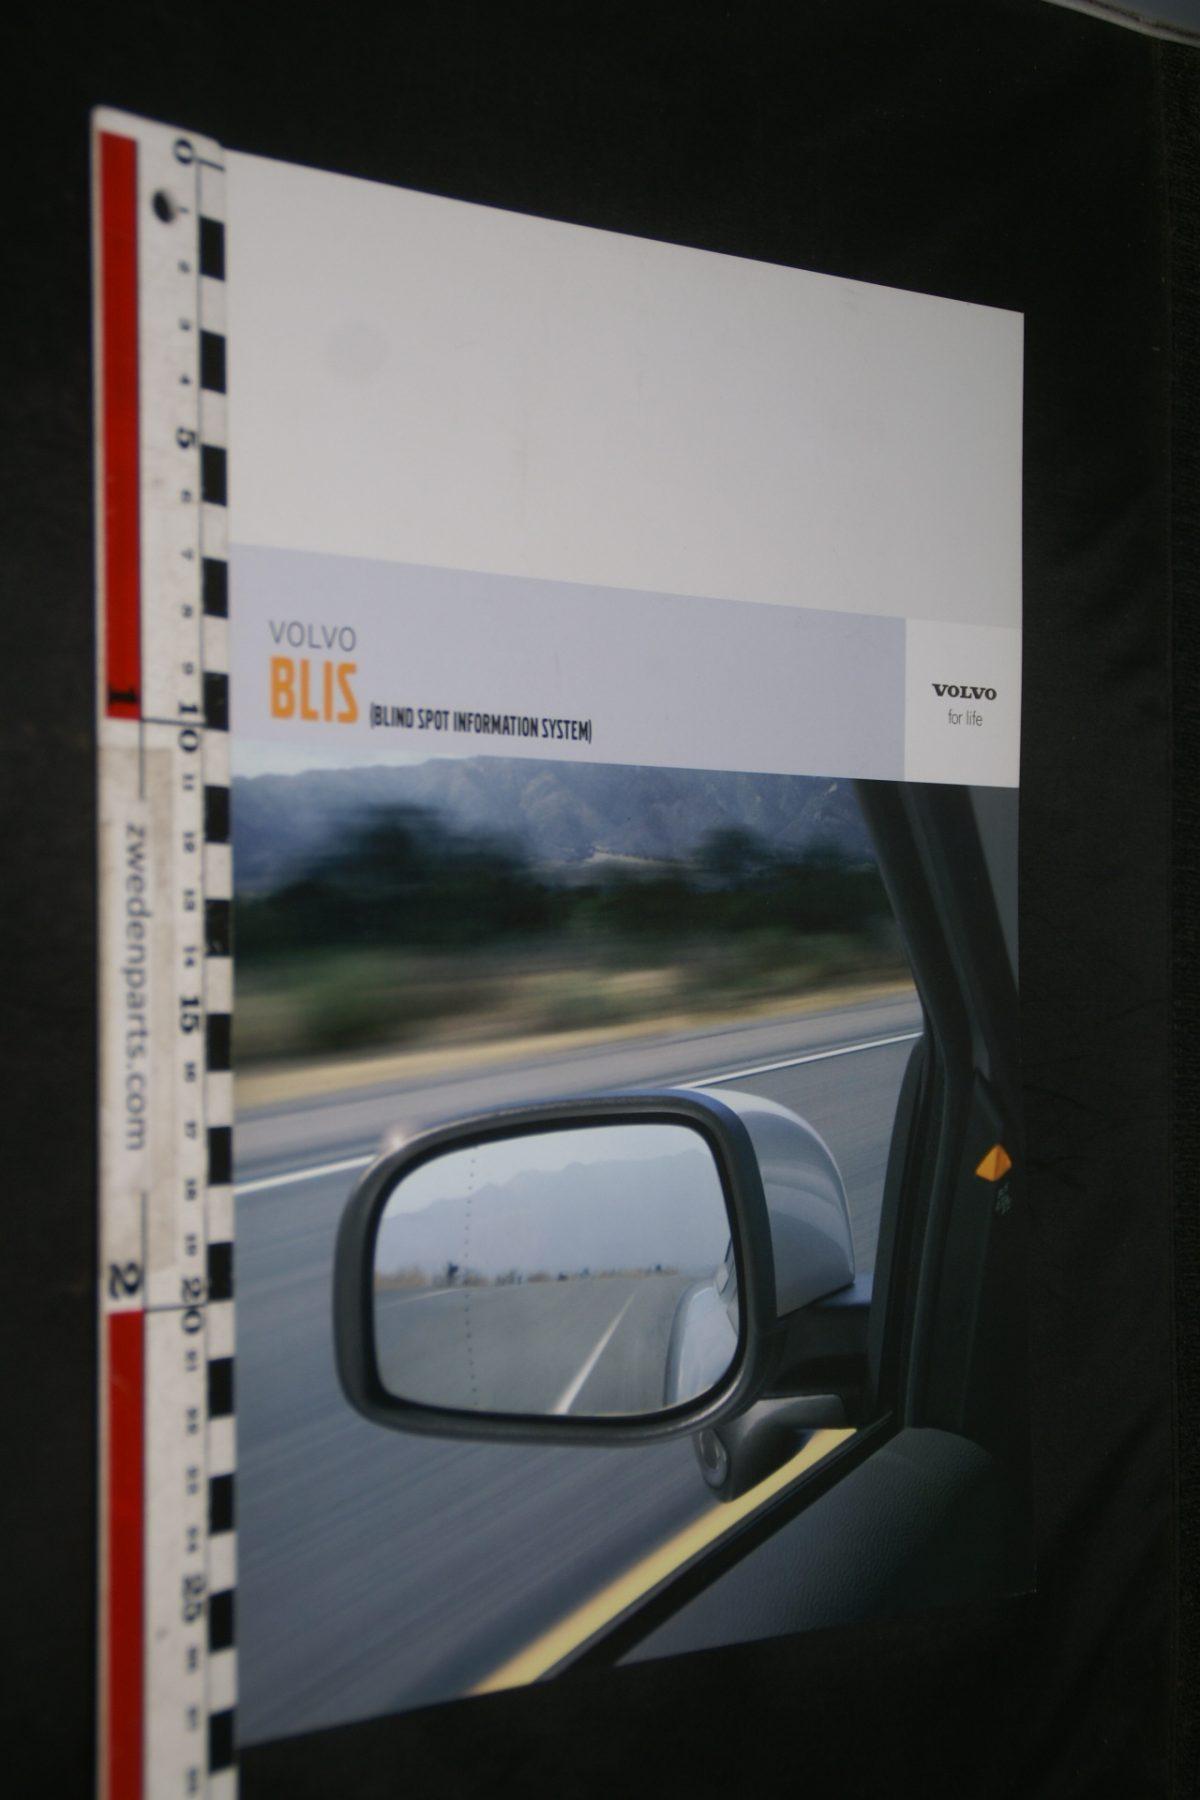 DSC06036 2005 brochure Volvo BLIS systeem nr. 0905V1